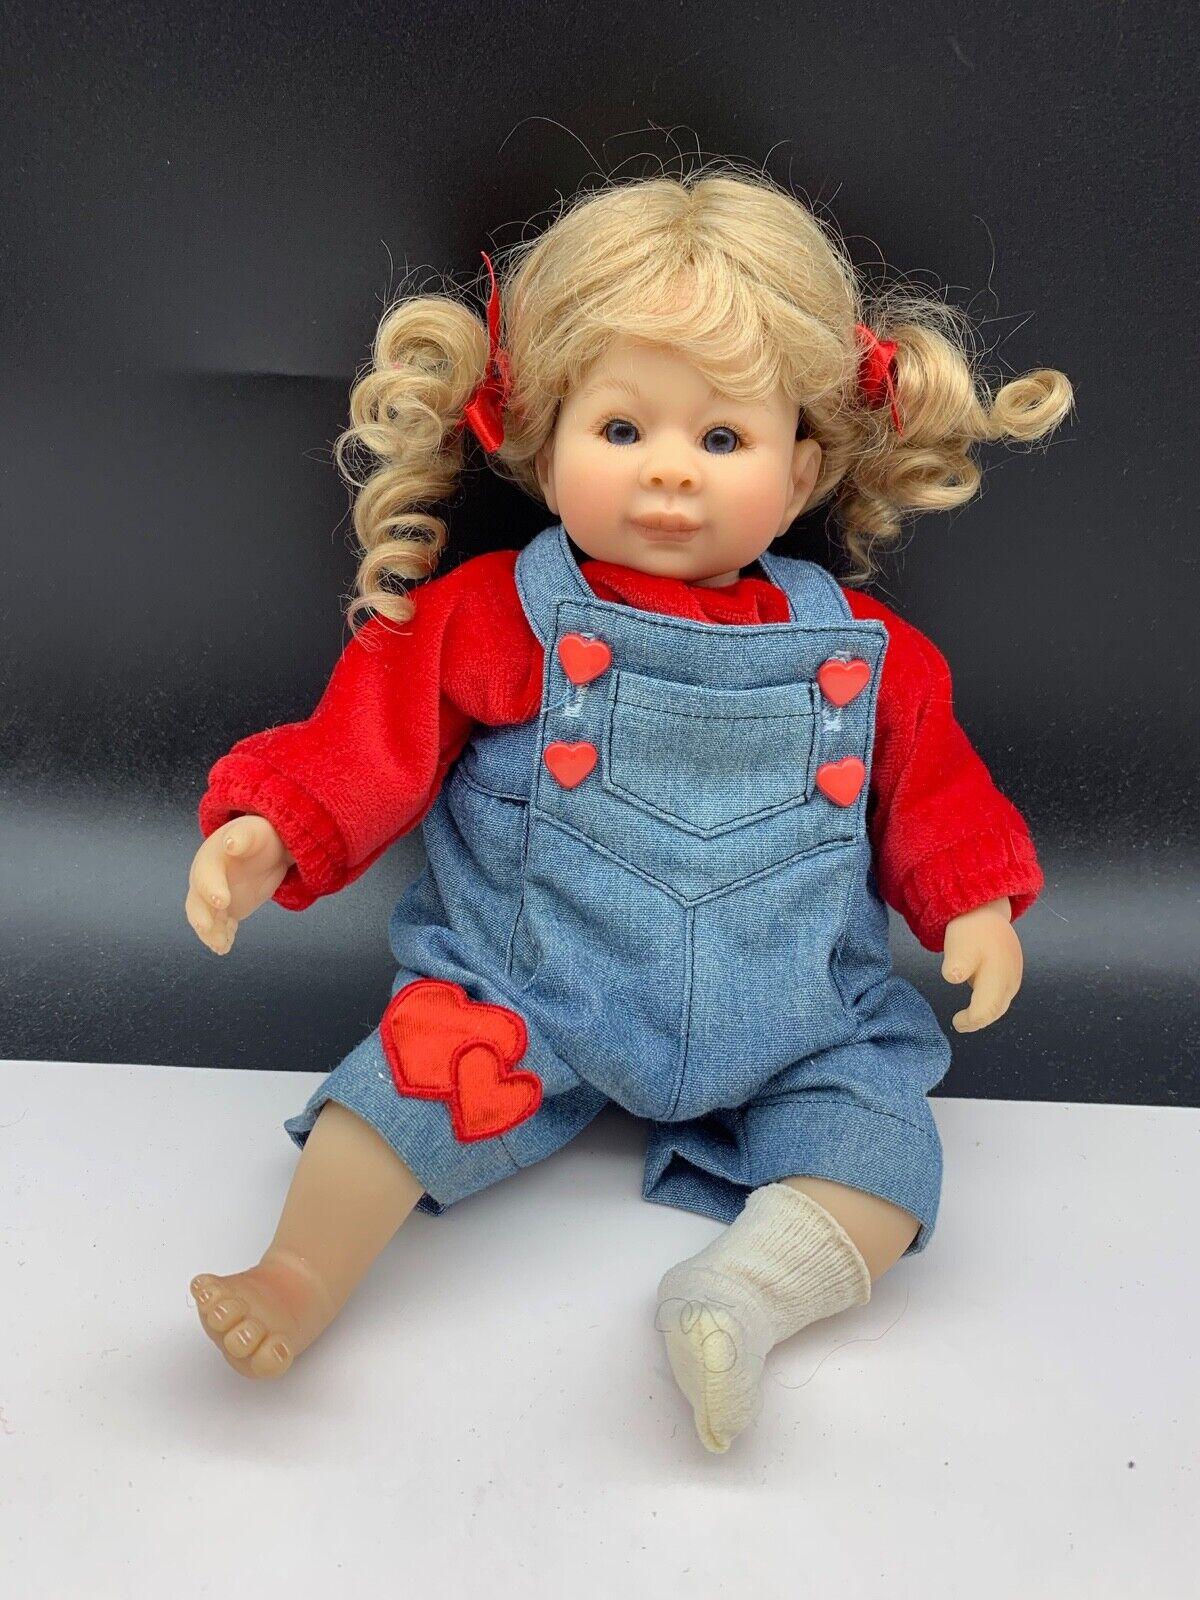 Monika peter leicht artisti BAMBOLA vinile bambola 28 CM.  OTTIMO stato  profitto zero